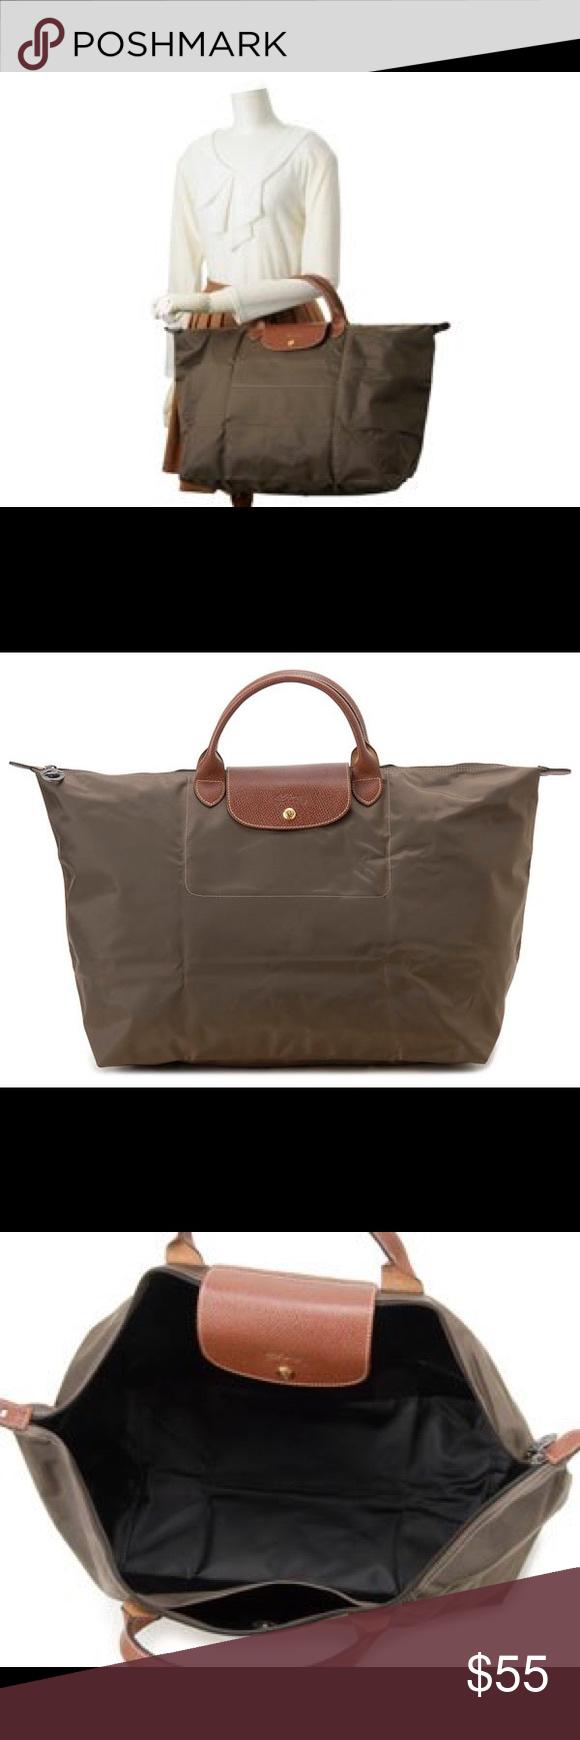 Longchamp Large Travel Bag Khaki   ReGreen Springfield 6dae1b27d5